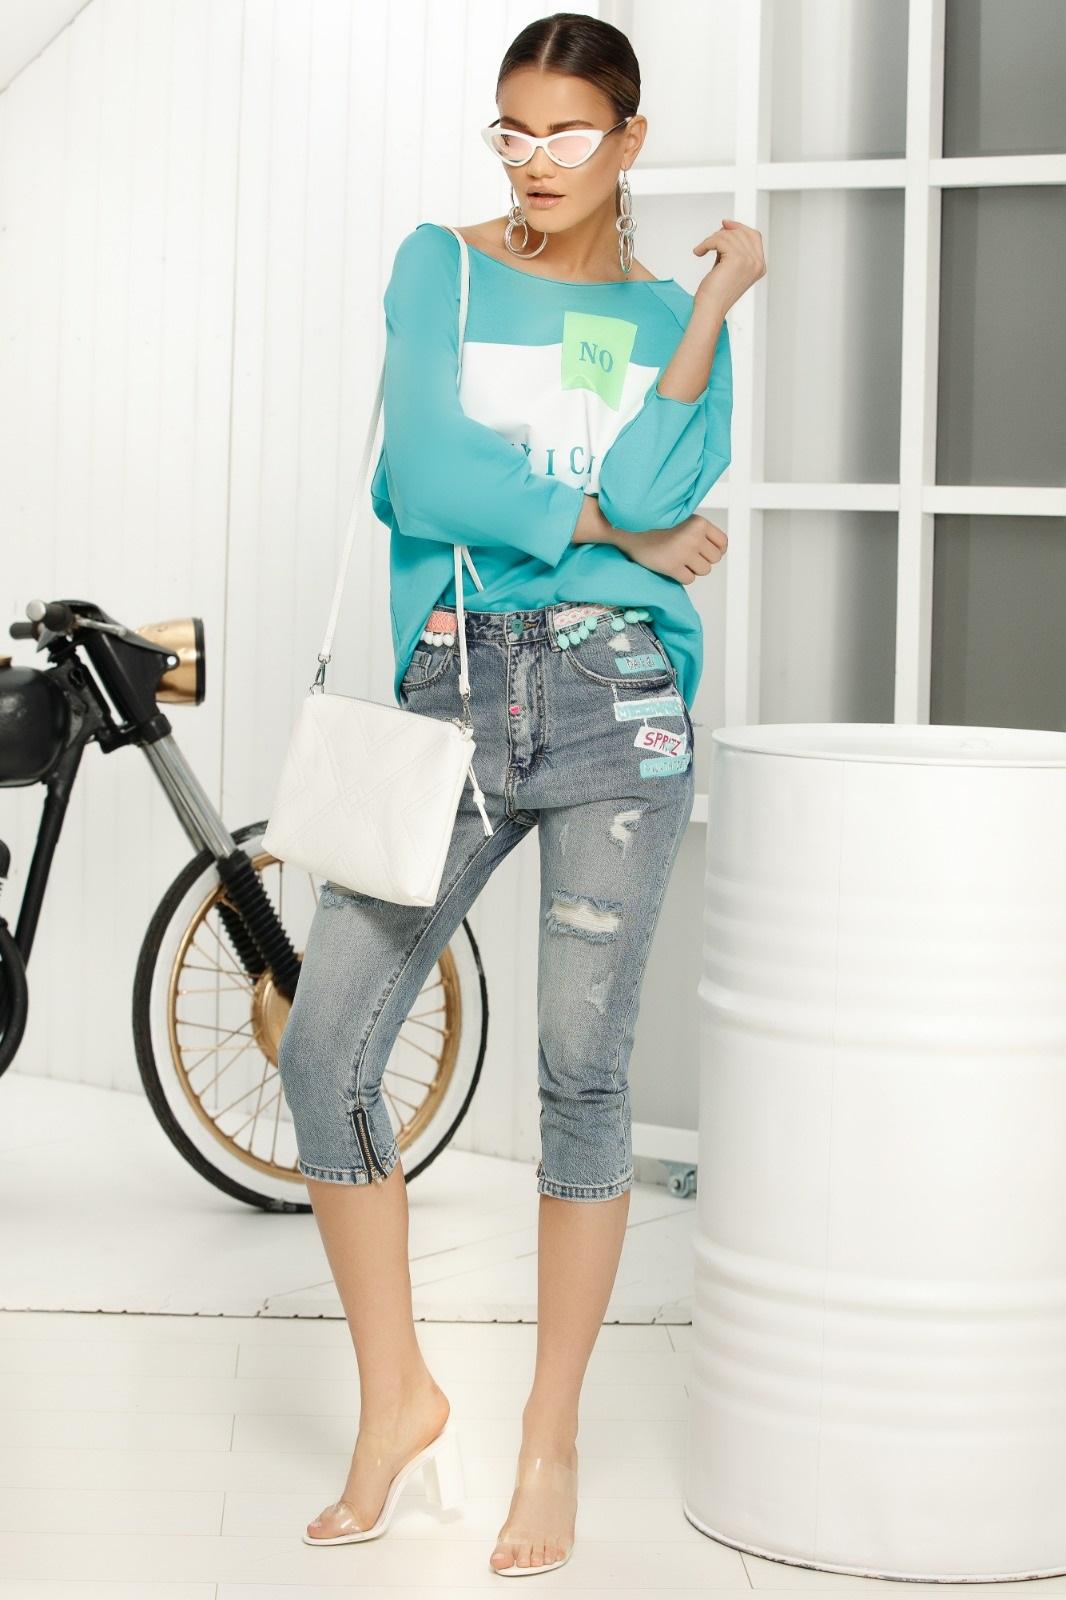 Blue casual jeans with medium waist 3/4 accesorissed with ruptures with medium waist